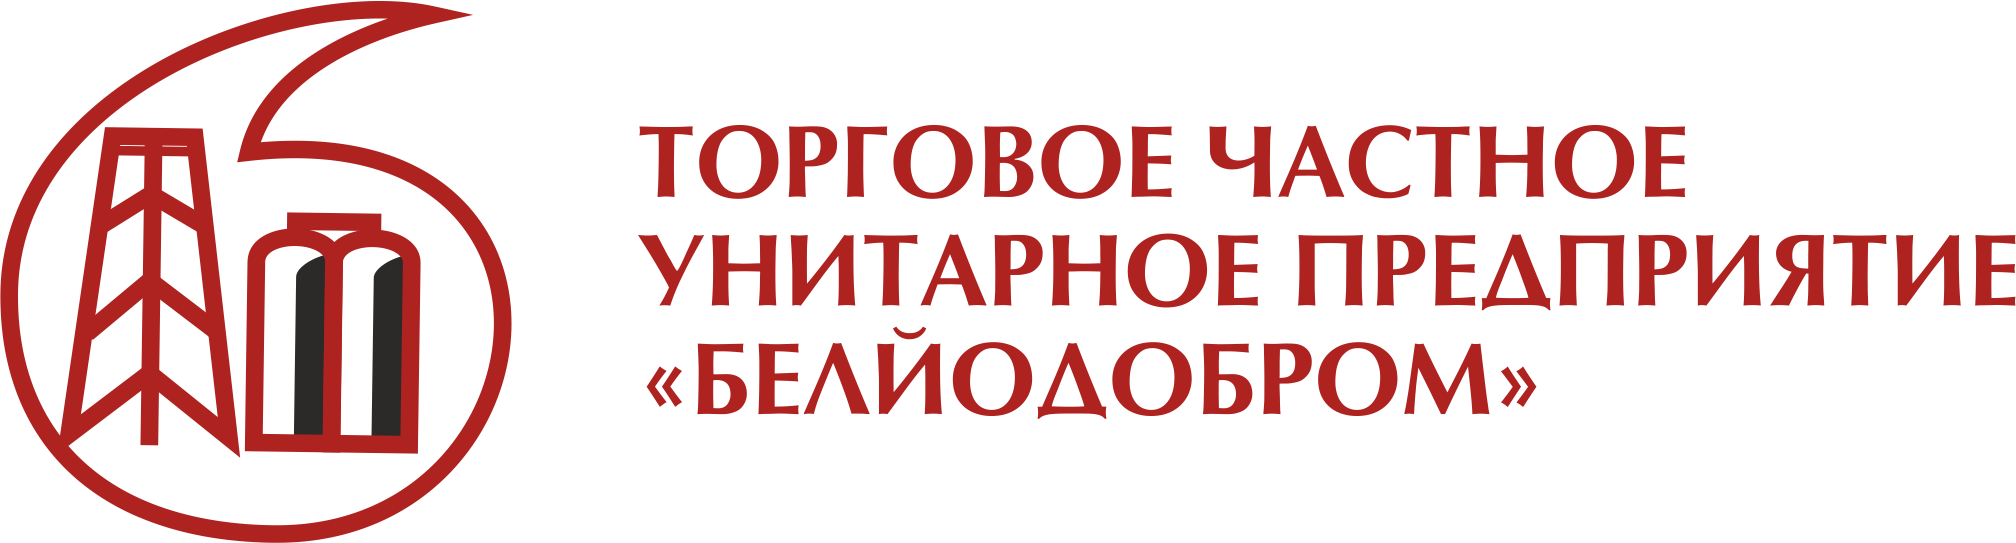 beliodbrom